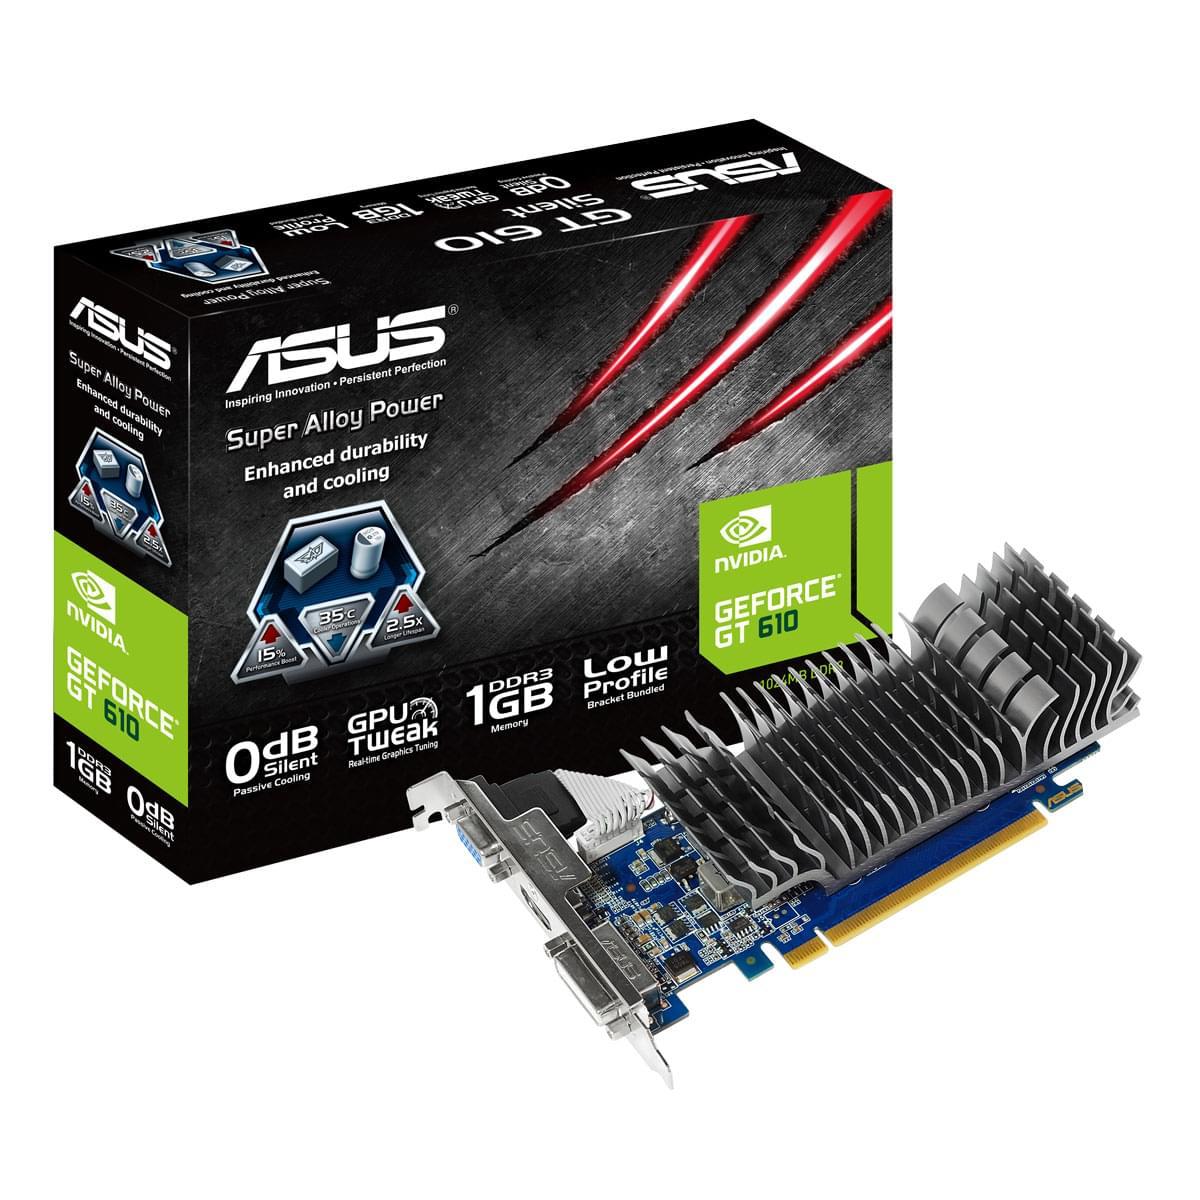 Asus  - 1Go - carte Graphique PC - GPU nVidia - 0